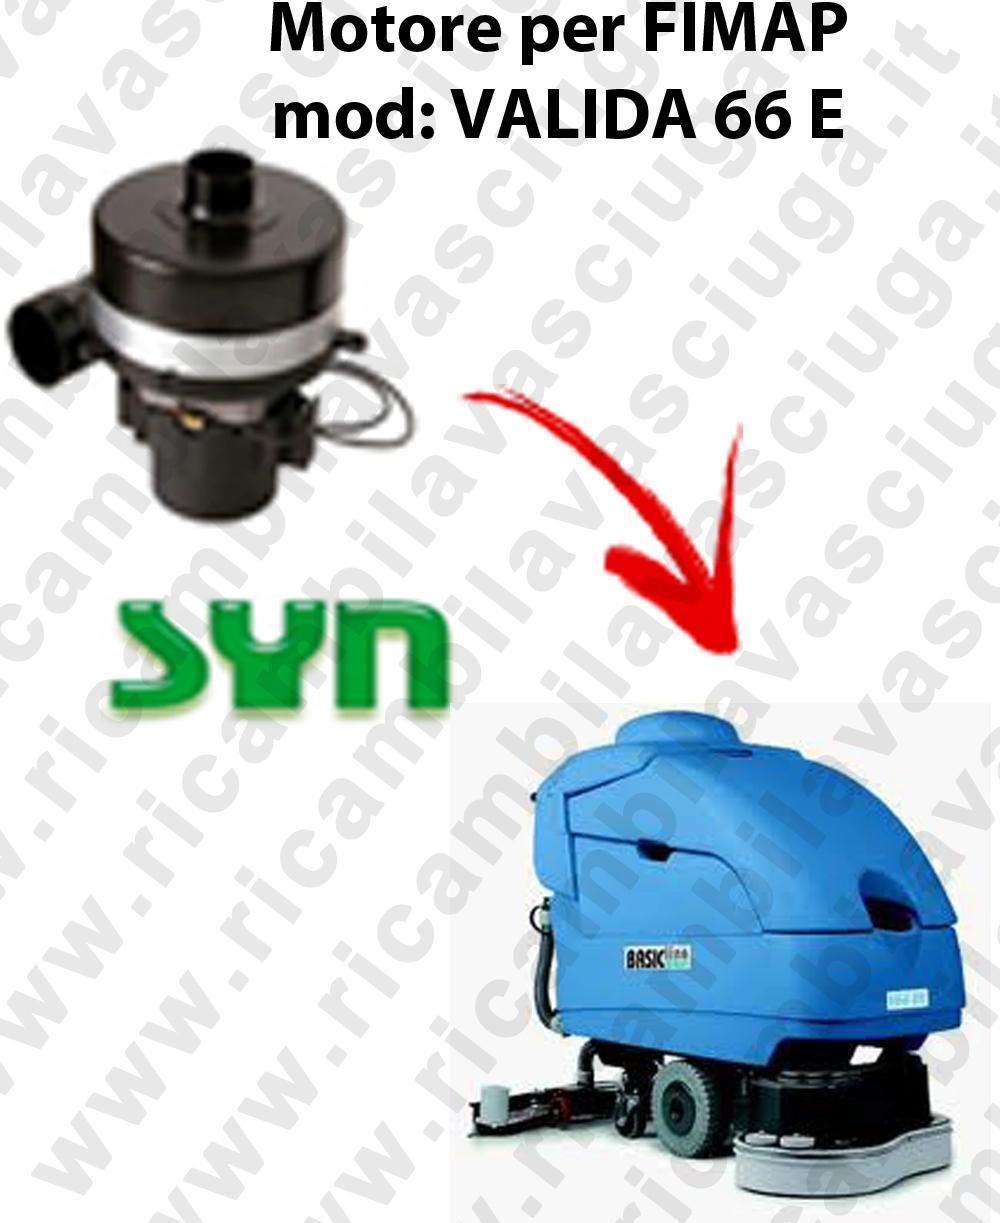 gültig 66 ünd Saugmotor SYNCLEAN für scheuersaugmaschinen FIMAP